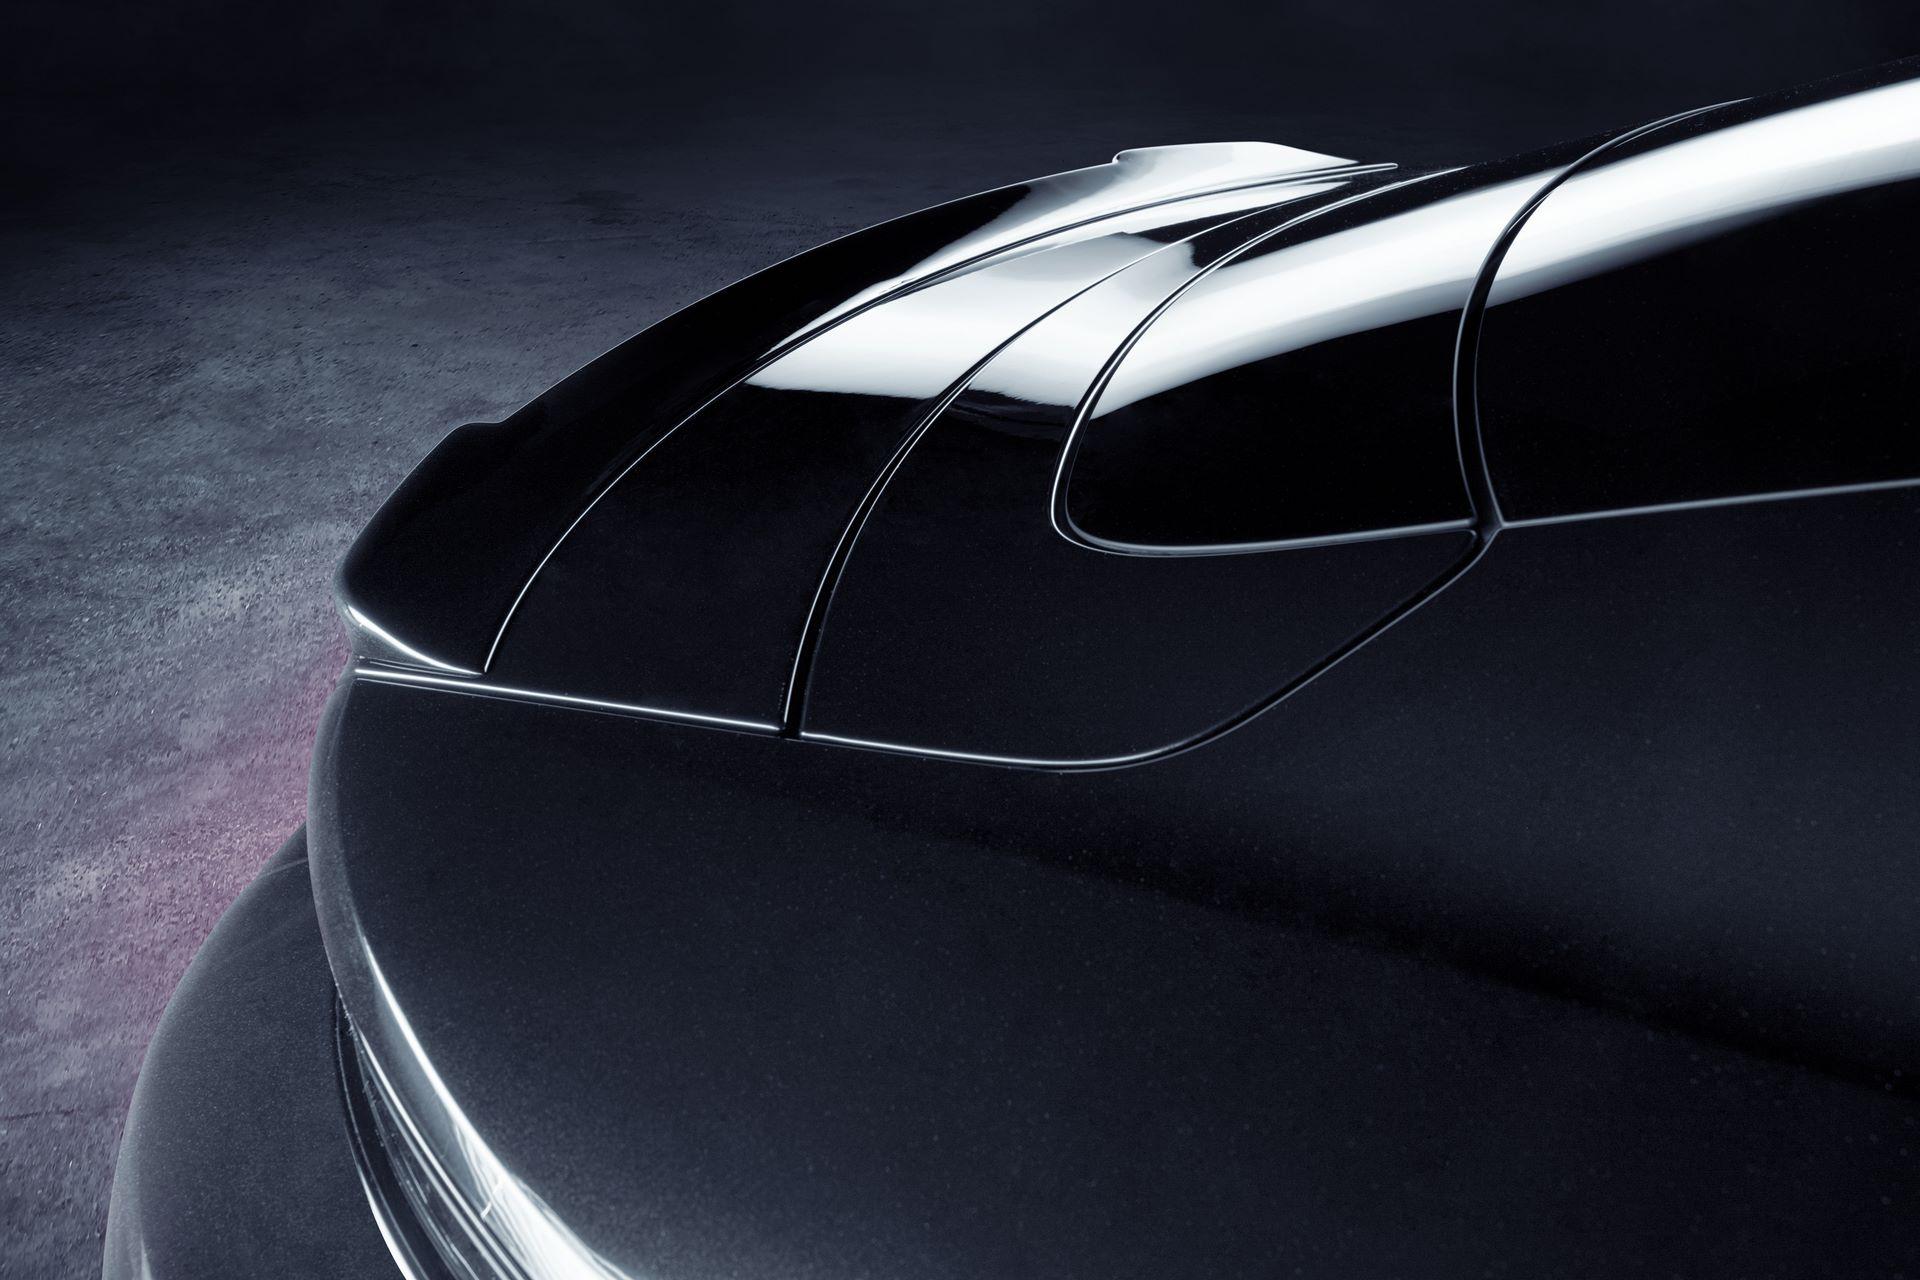 Porsche-Taycan-bodykit-by-TechArt-25